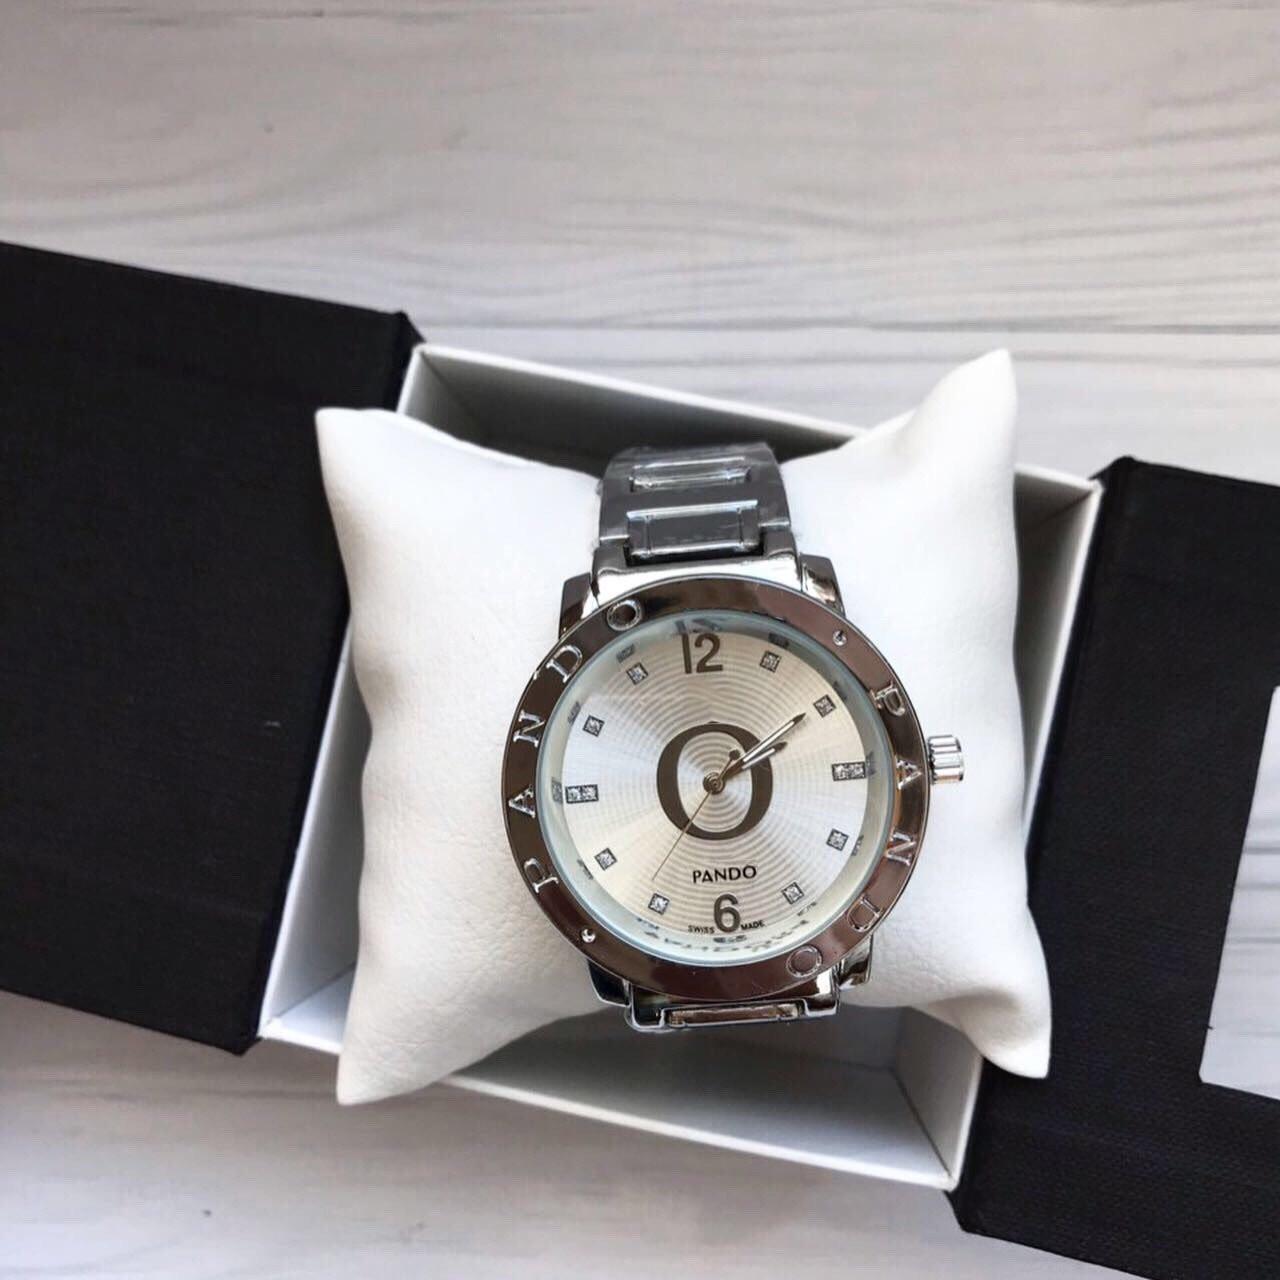 Женские часы Pandora опт дропшиппинг розница Реплика пандора